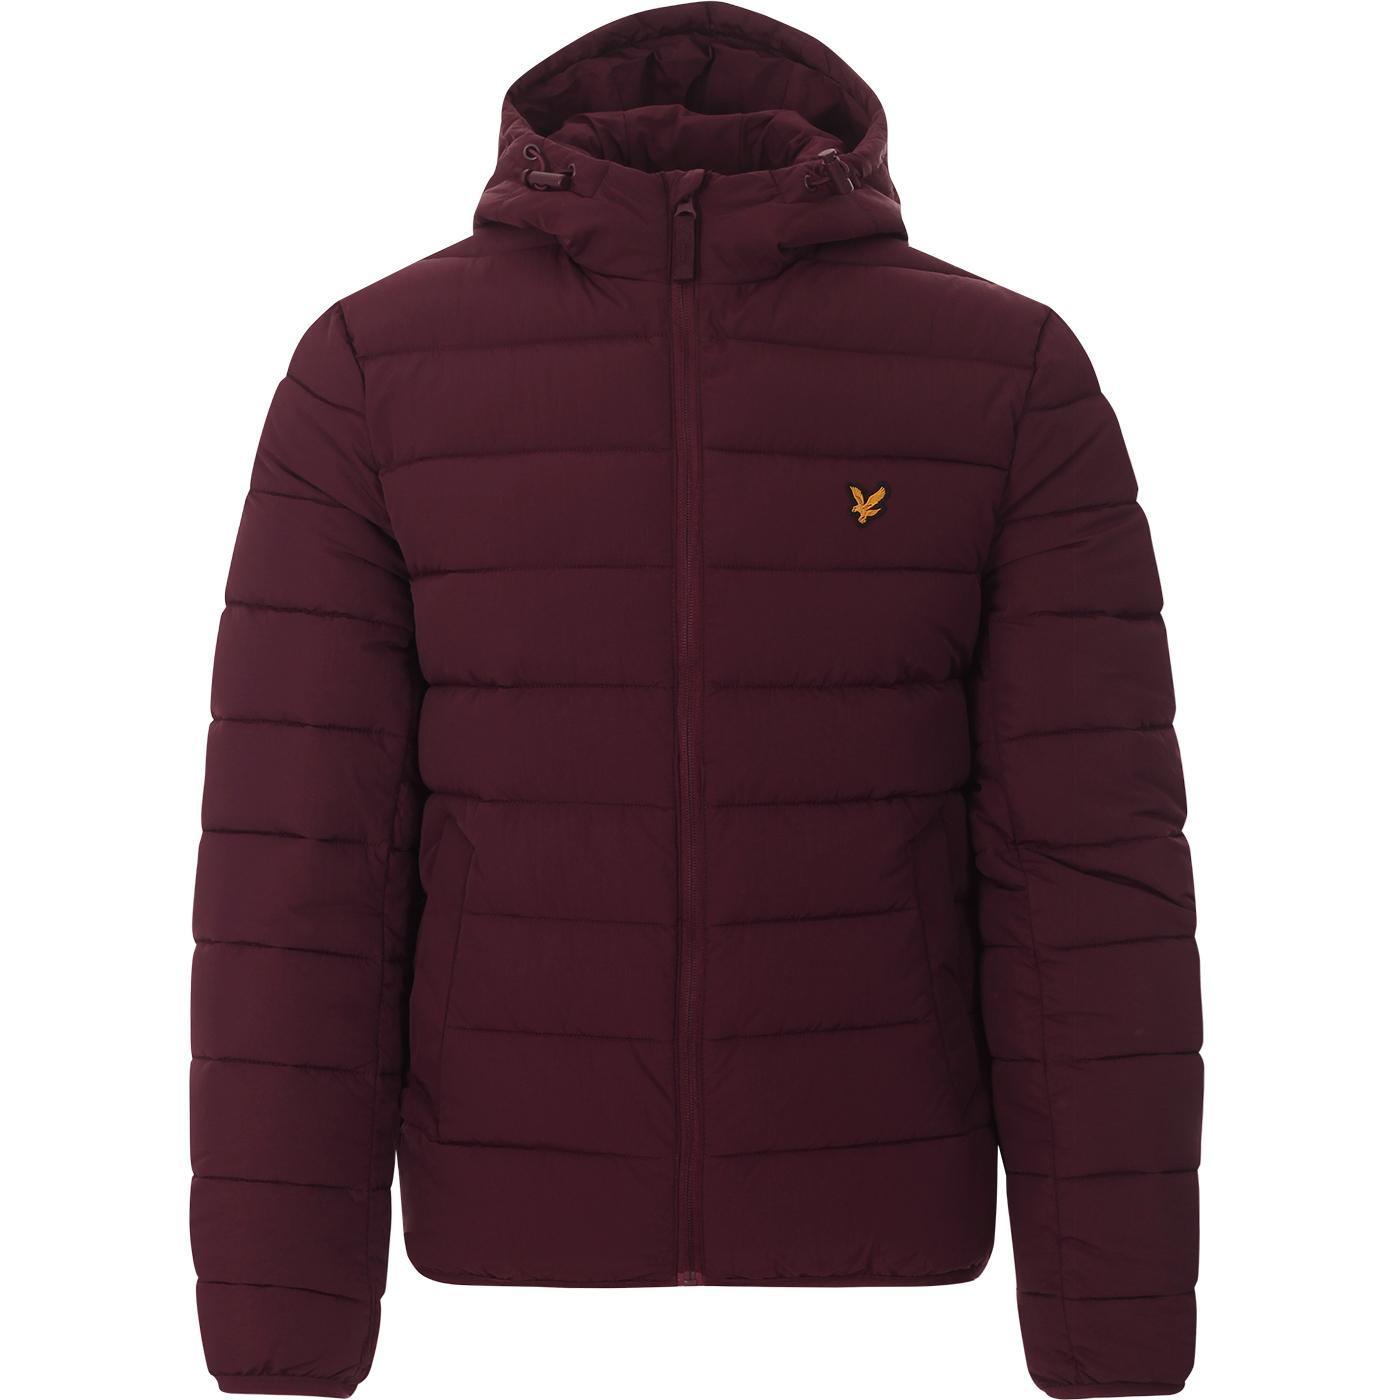 LYLE & SCOTT Lightweight Puffer Jacket (Burgundy)